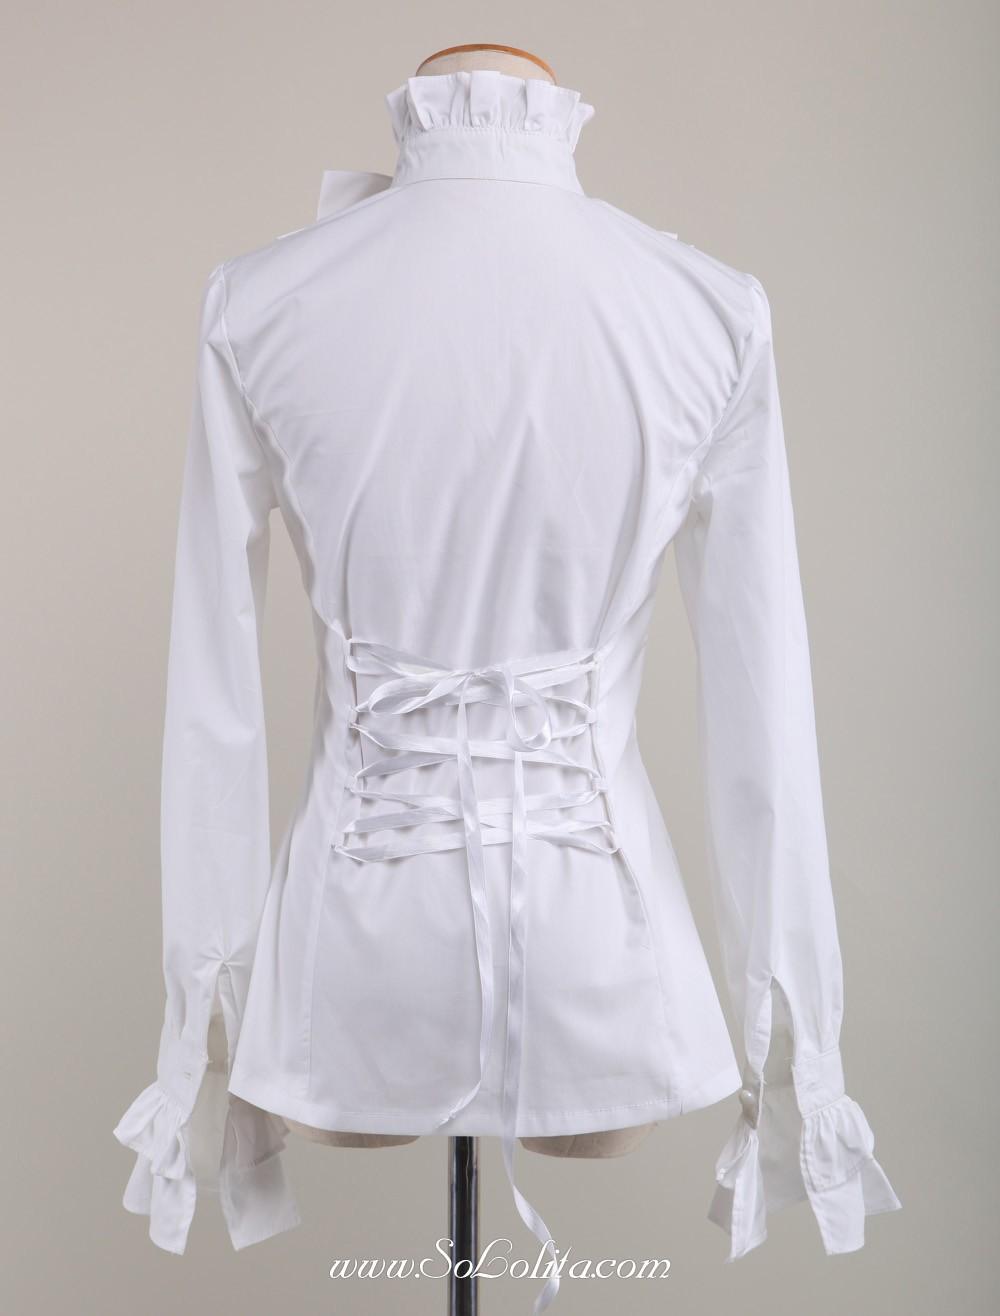 Lolita Corset Pur Kawaii Papillon Dame Noeud Blouse Blanc q1HwTq